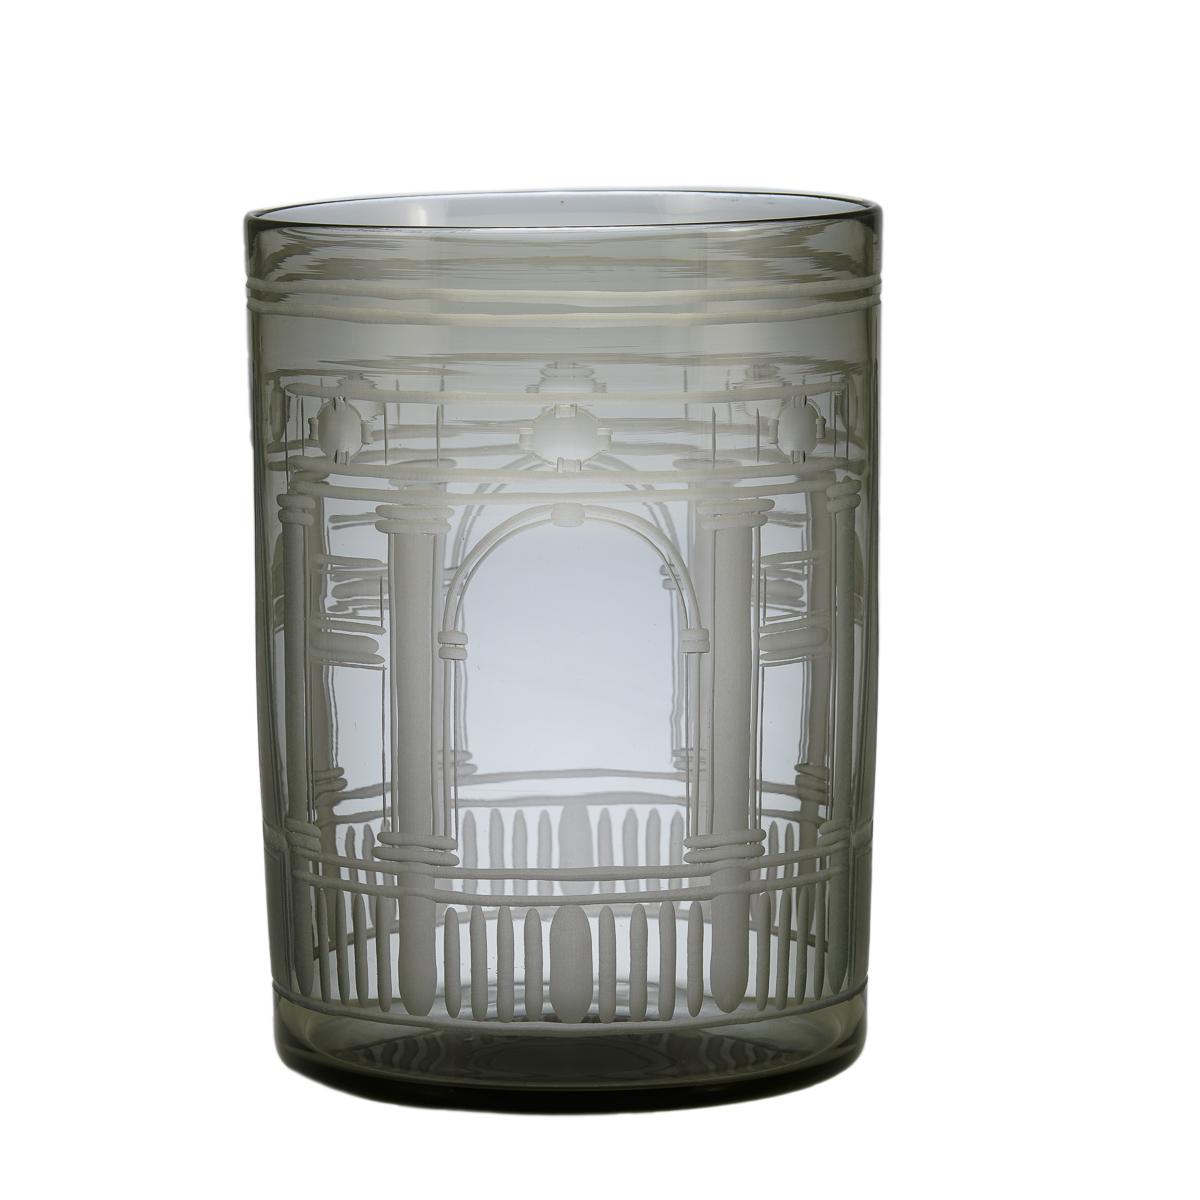 palazzo-papadopoli-vase-candle-crystal-grey-murano-giberto-design-precious-luxury-handmade-flower